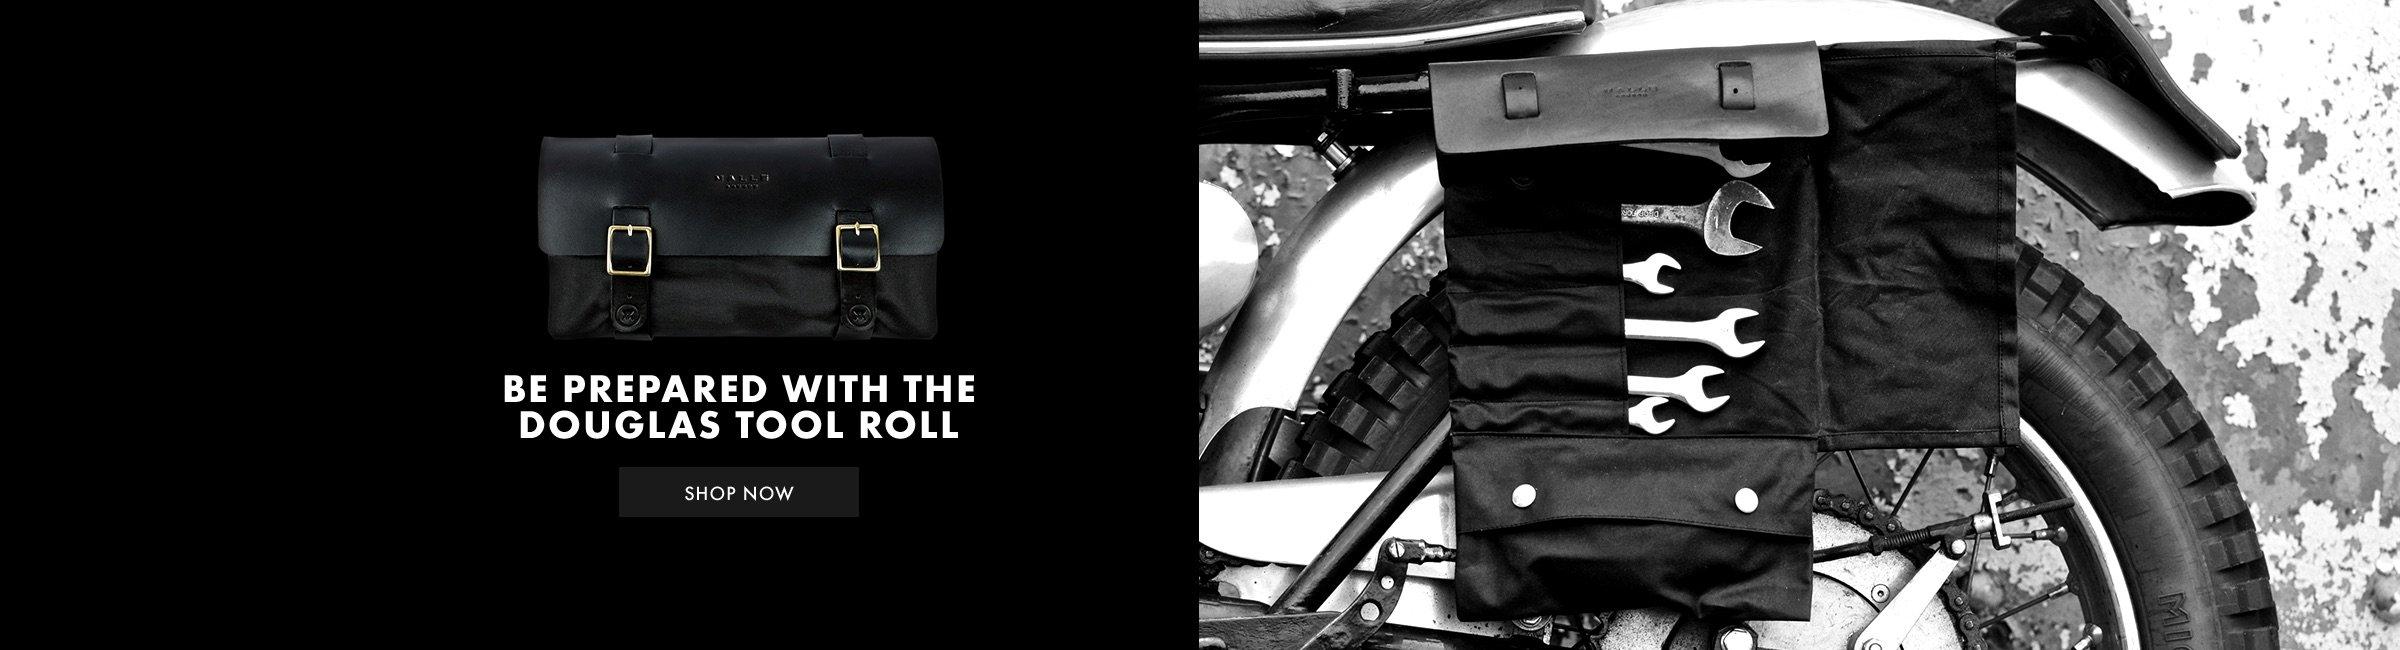 Douglas-Tool-Roll2-1